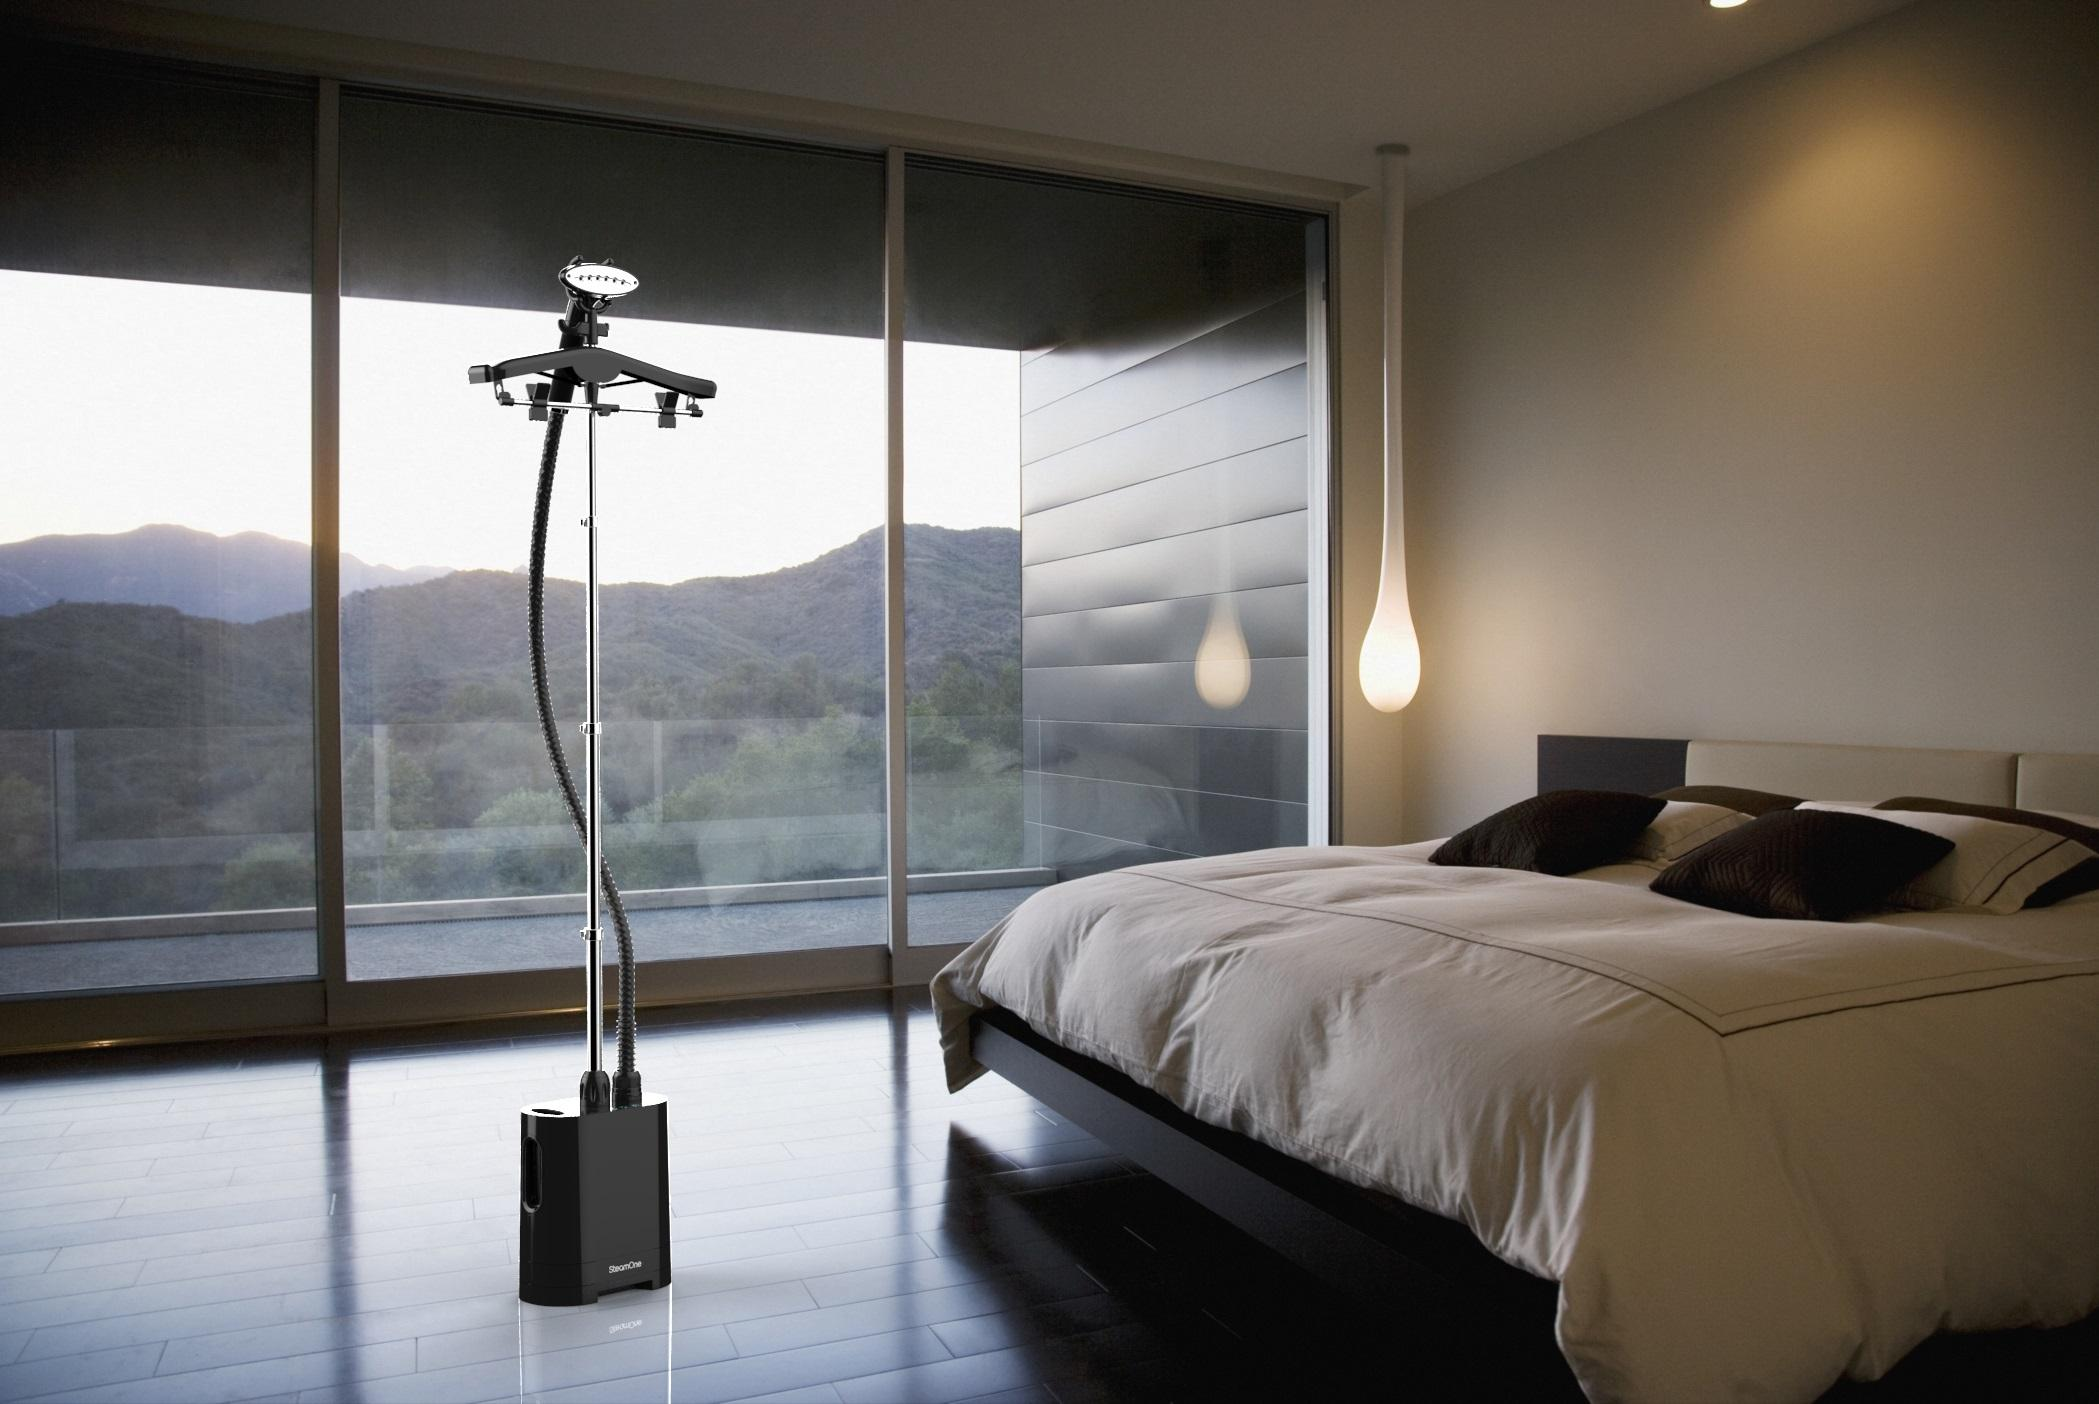 steamone defroisseur vertical hu 190 gb cuisine maison. Black Bedroom Furniture Sets. Home Design Ideas